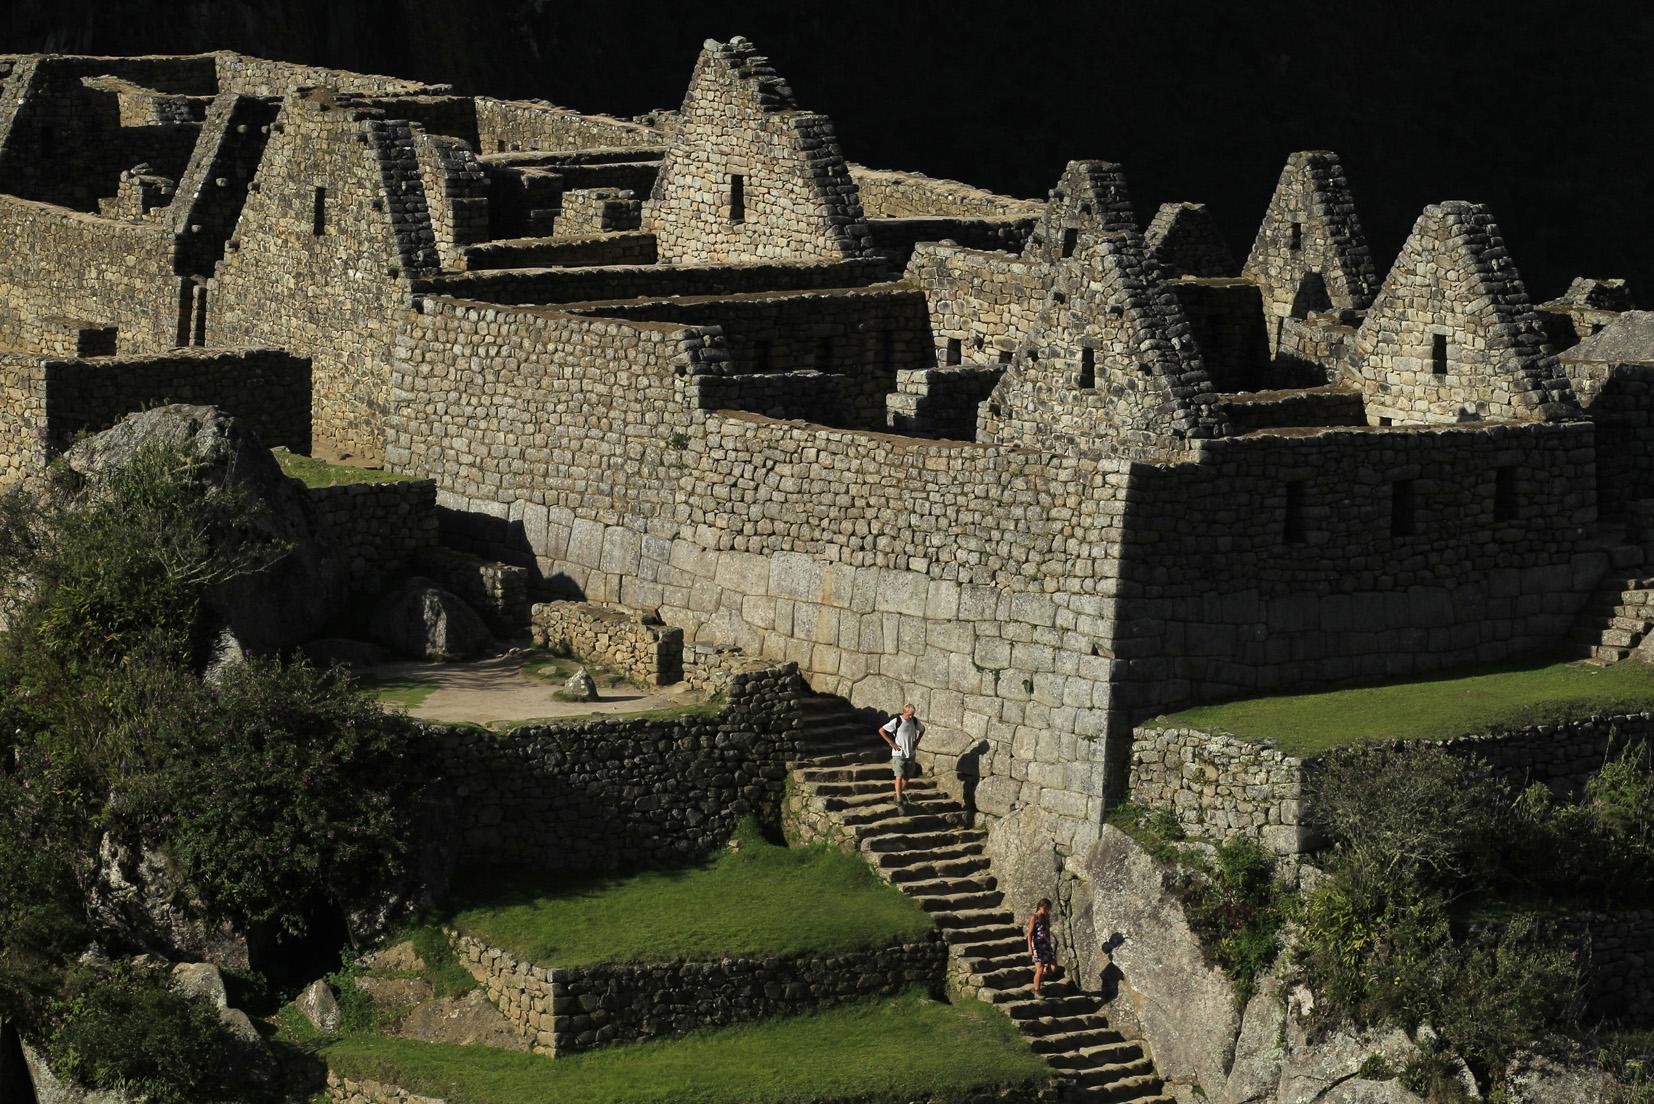 Ciudadela Inca de Machu Picchu, Cuzco, 6 de Diciembre 2011. Foto: Pilar Olivares/Promperu